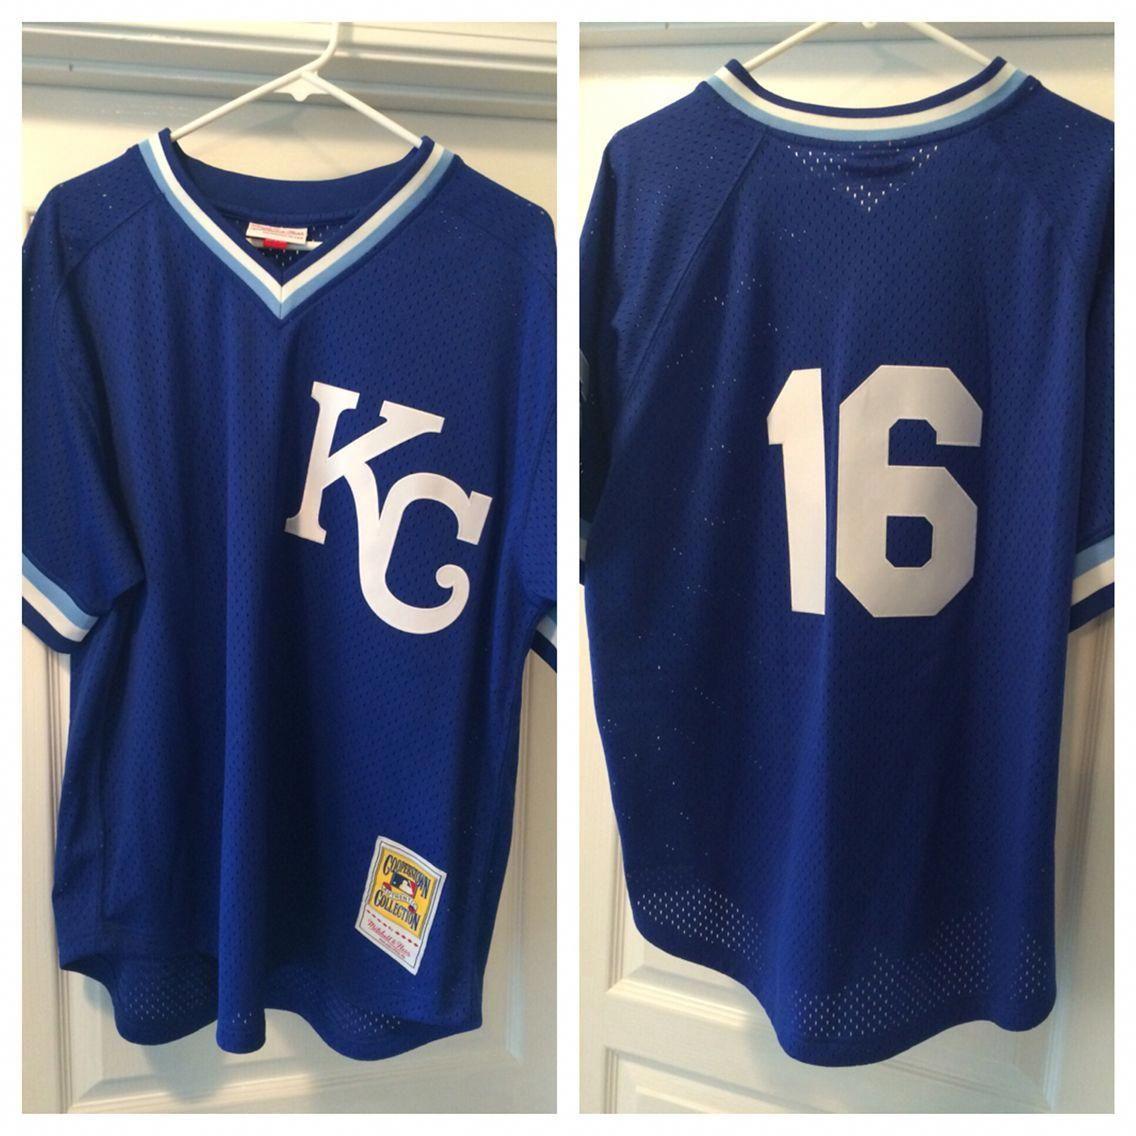 quality design 9c568 f2133 1989 Bo Jackson Batting Practice, 2015 MLB.com #mlbcom ...